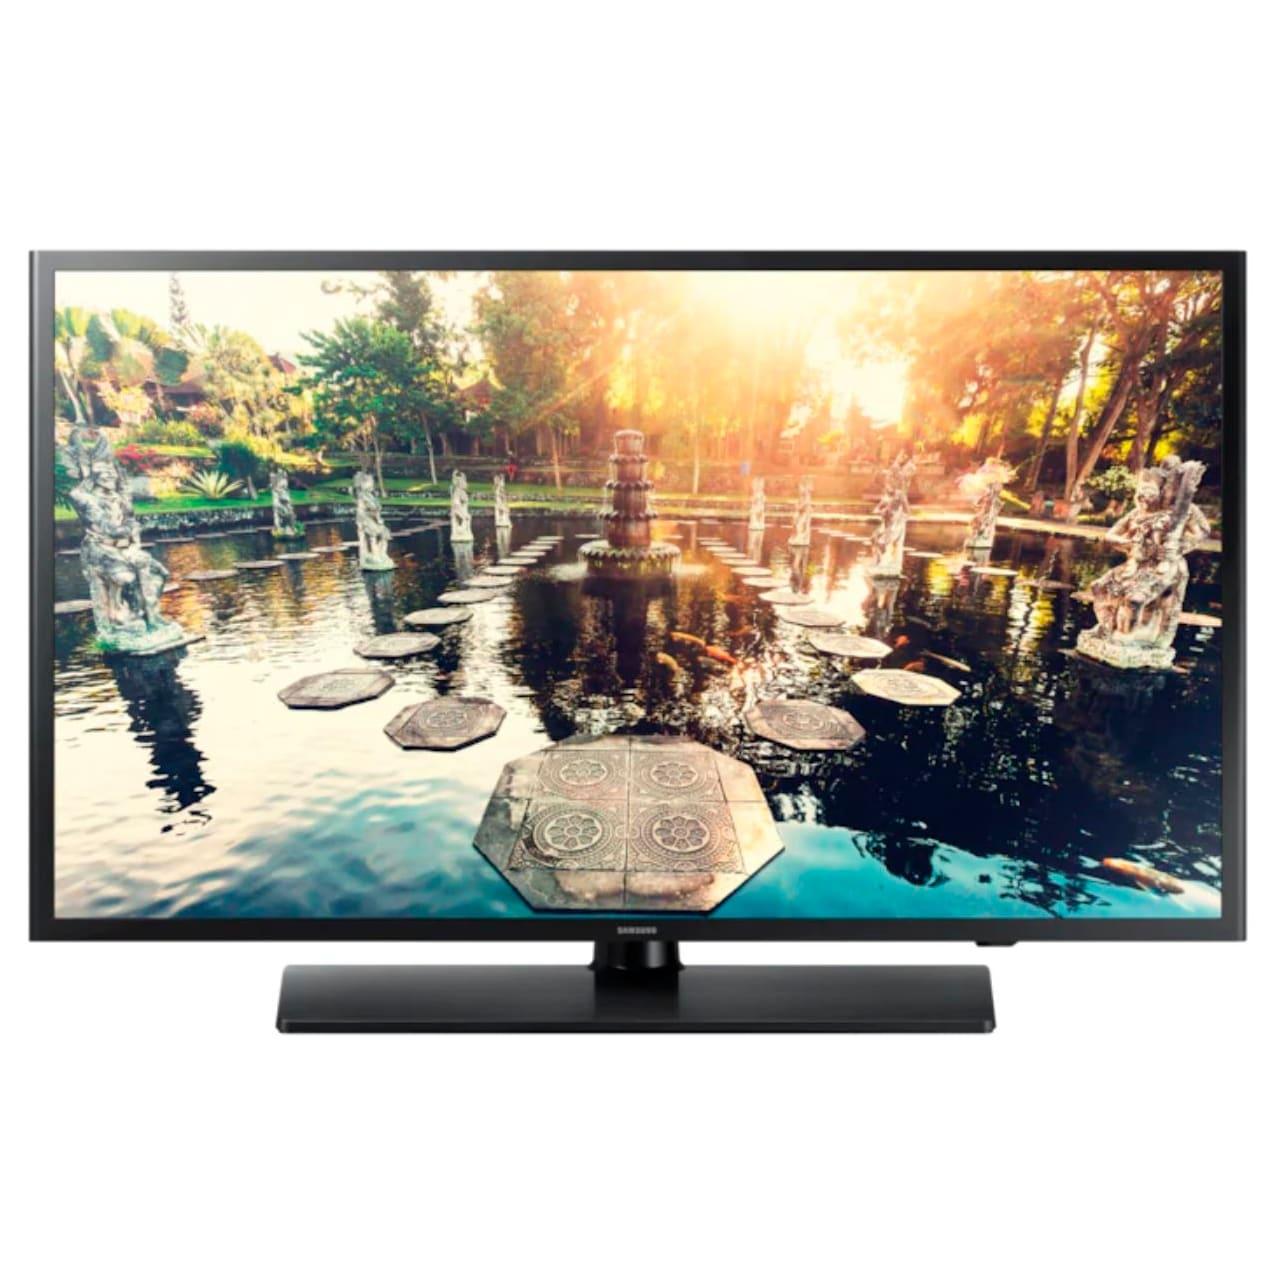 TV-og-tilbehoer-70073820_large